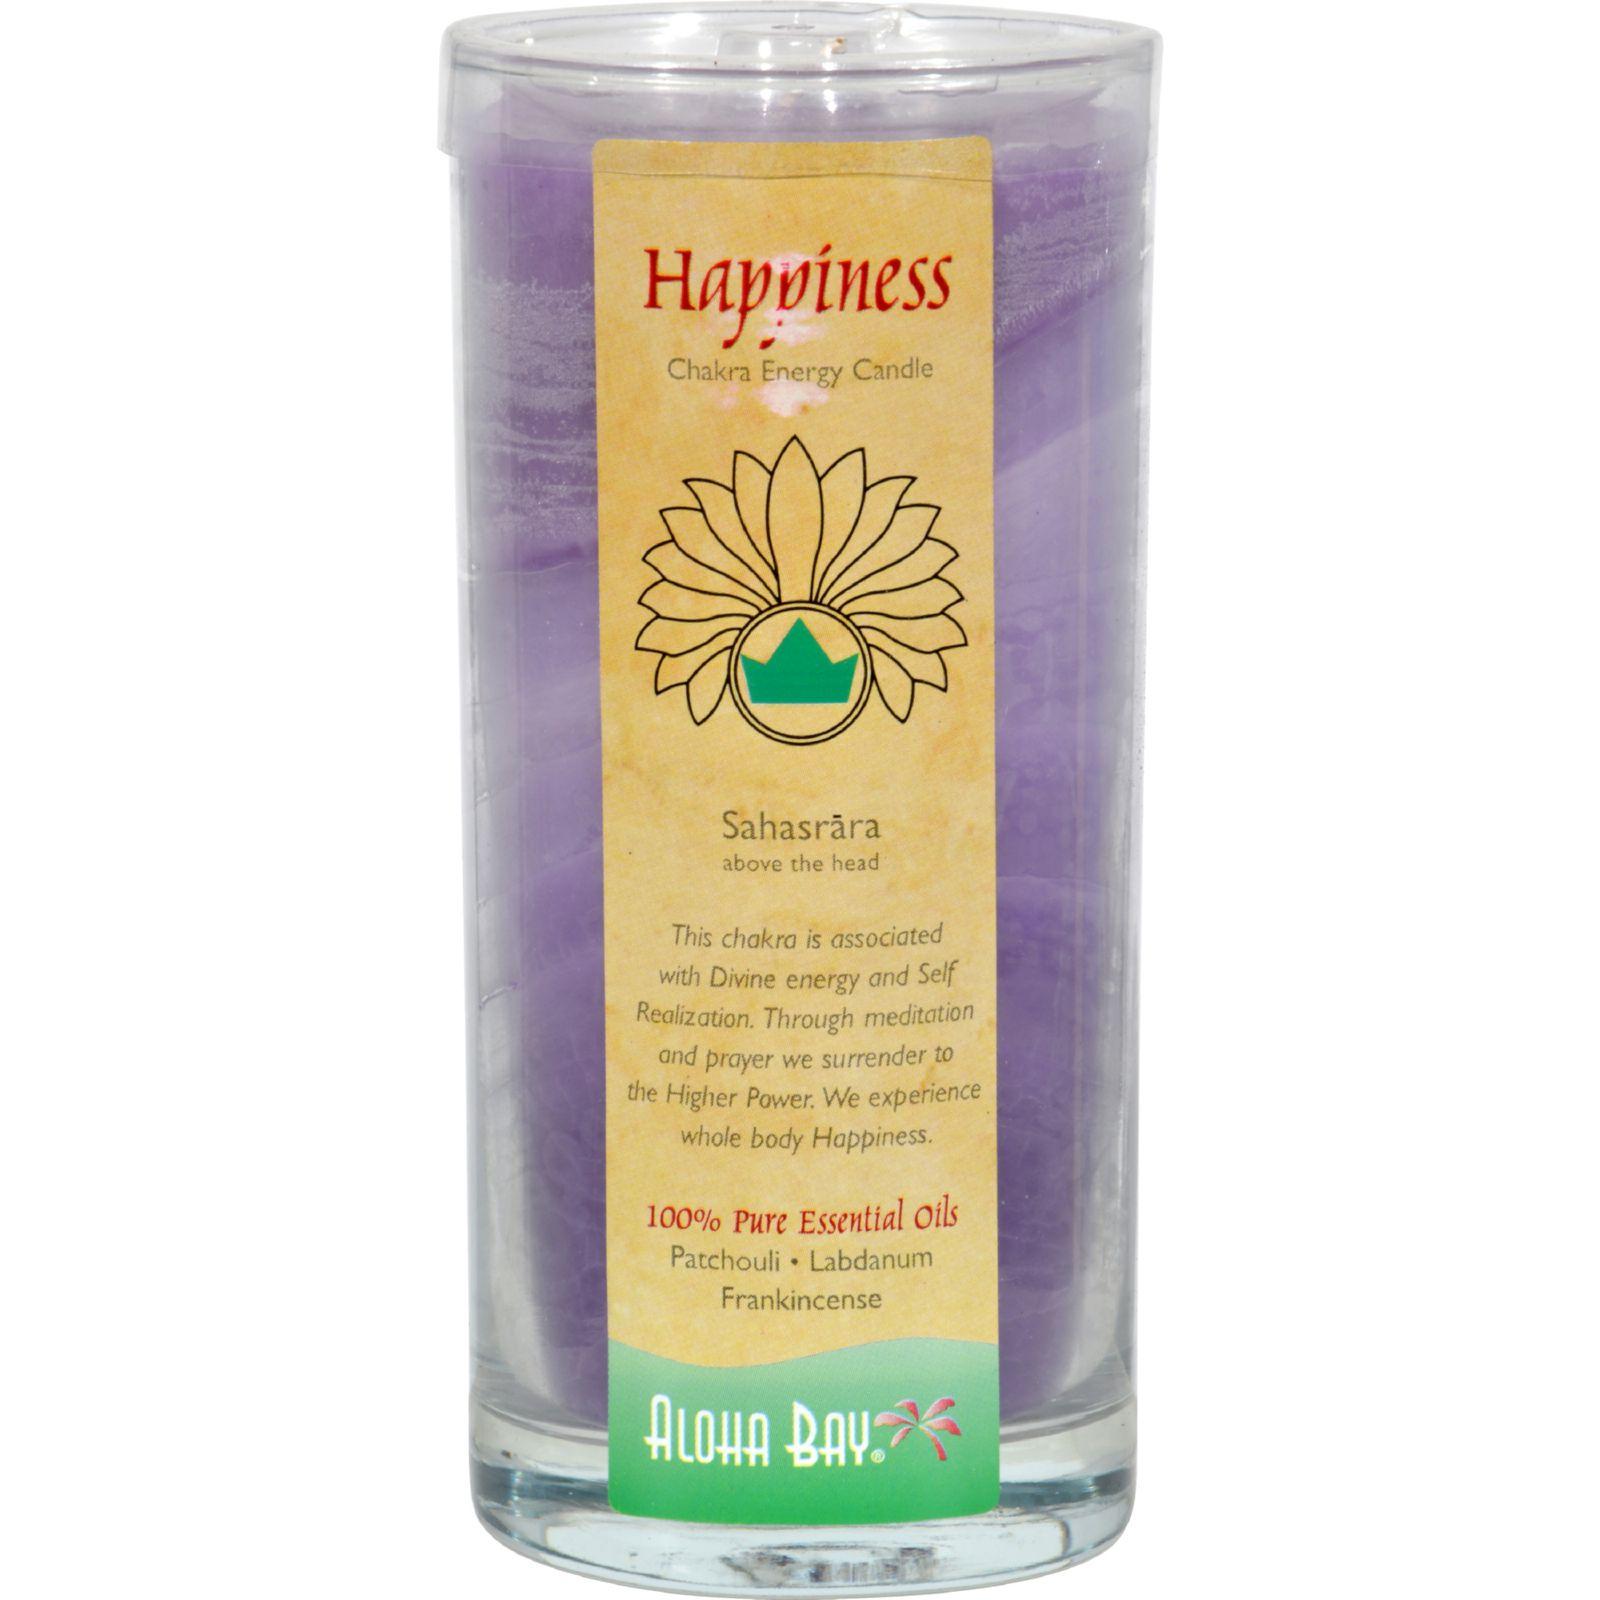 Aloha Bay - Chakra Energy Candle Jar Happiness - 11 oz.